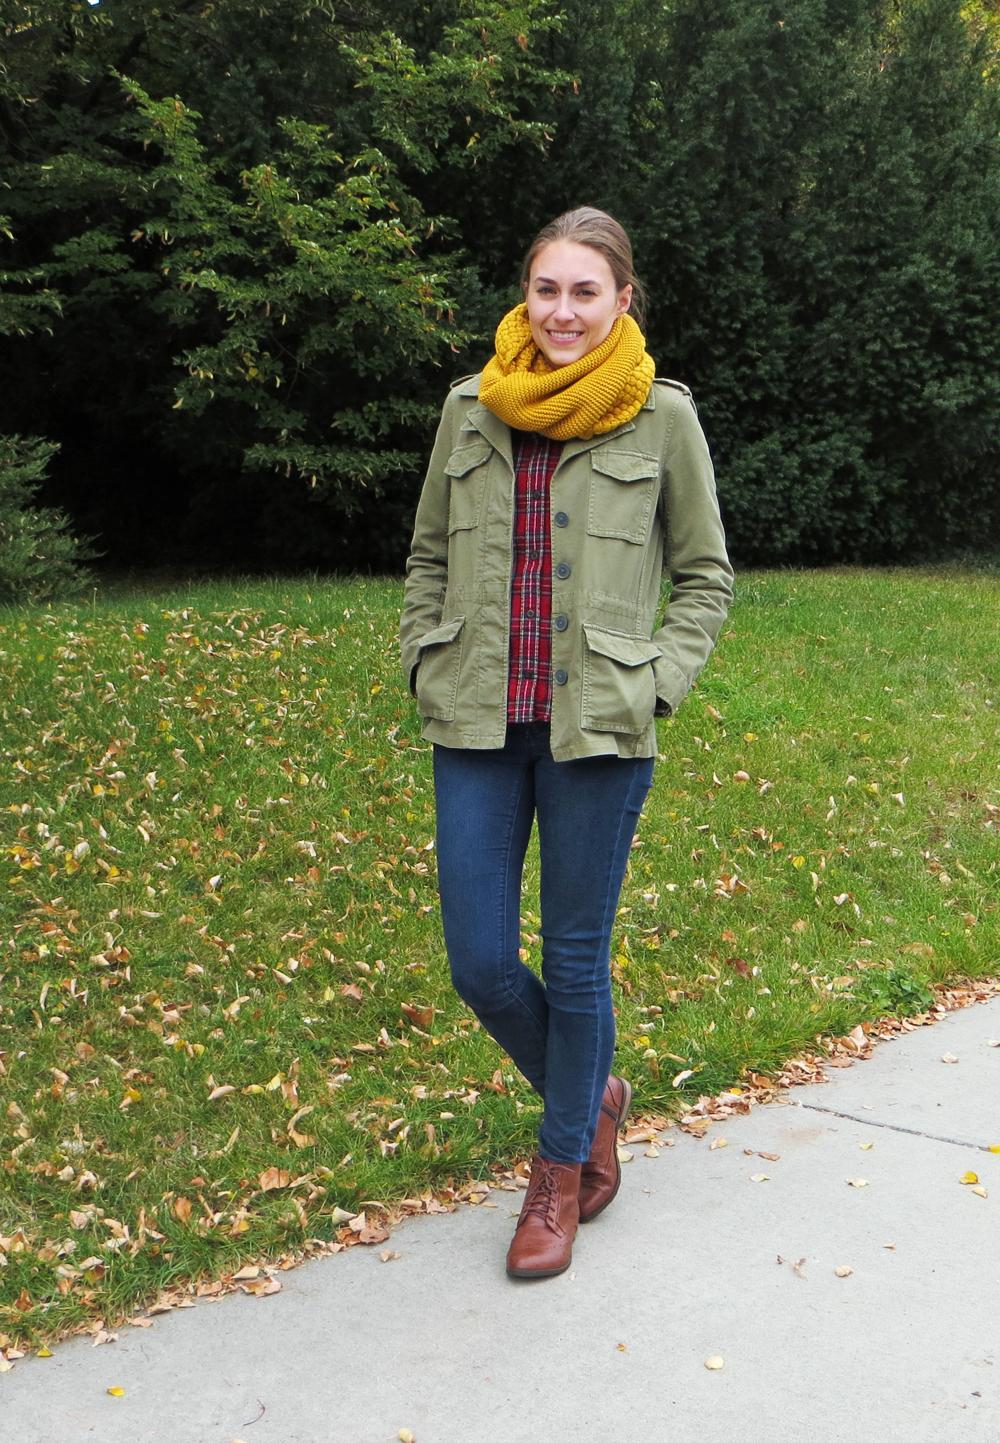 Chelsea Crew lace-up oxford boots — Cotton Cashmere Cat Hair